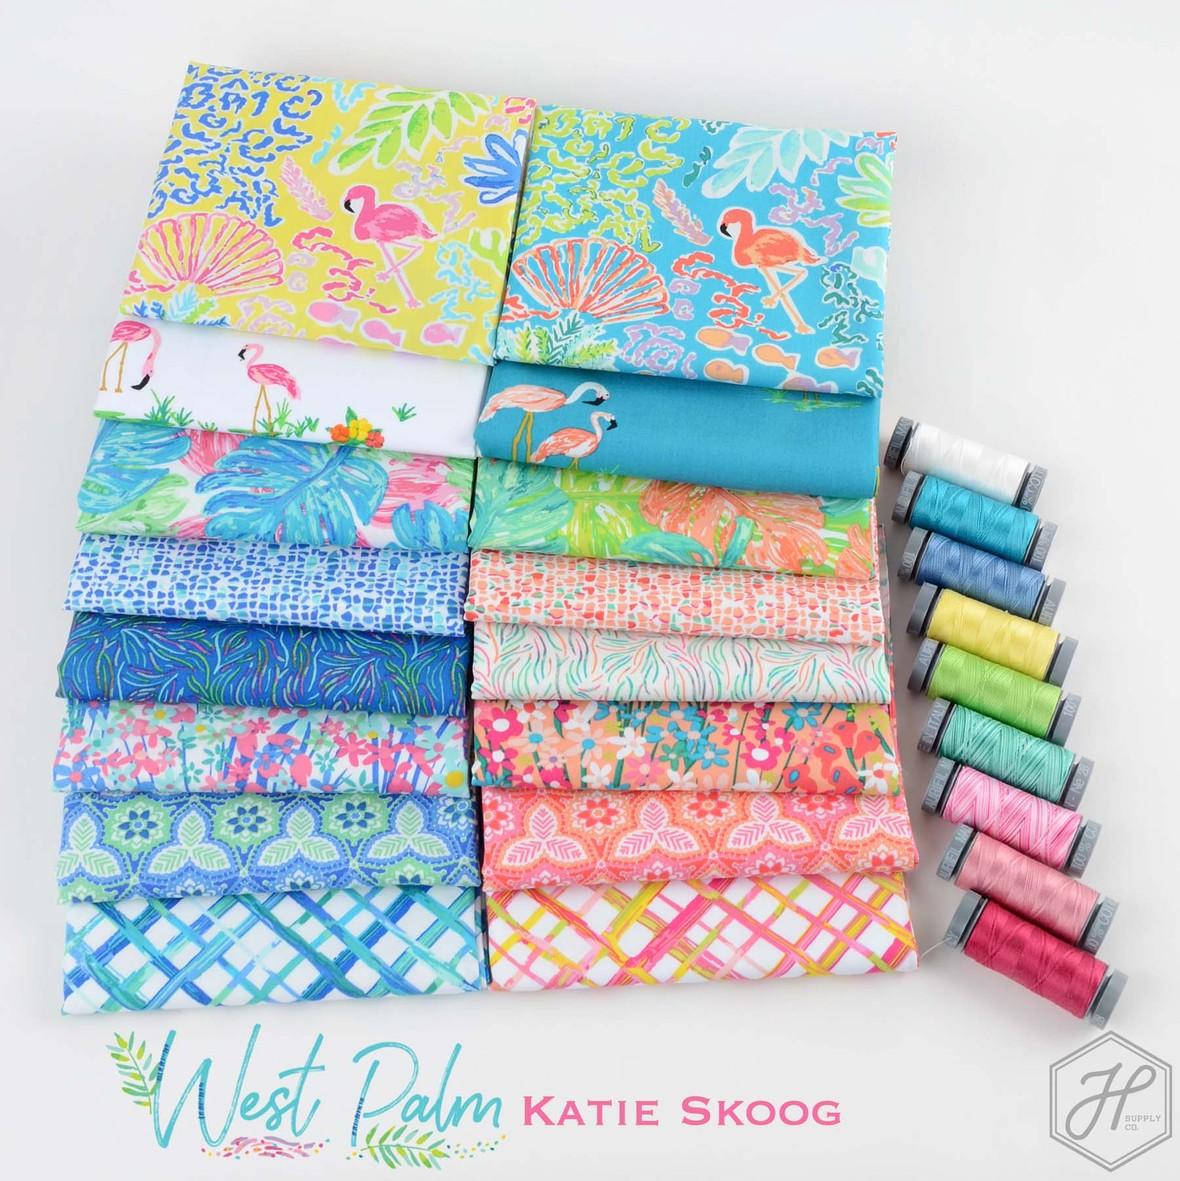 West Palm Fabric Katie Skoog at Hawthorne Supply Co